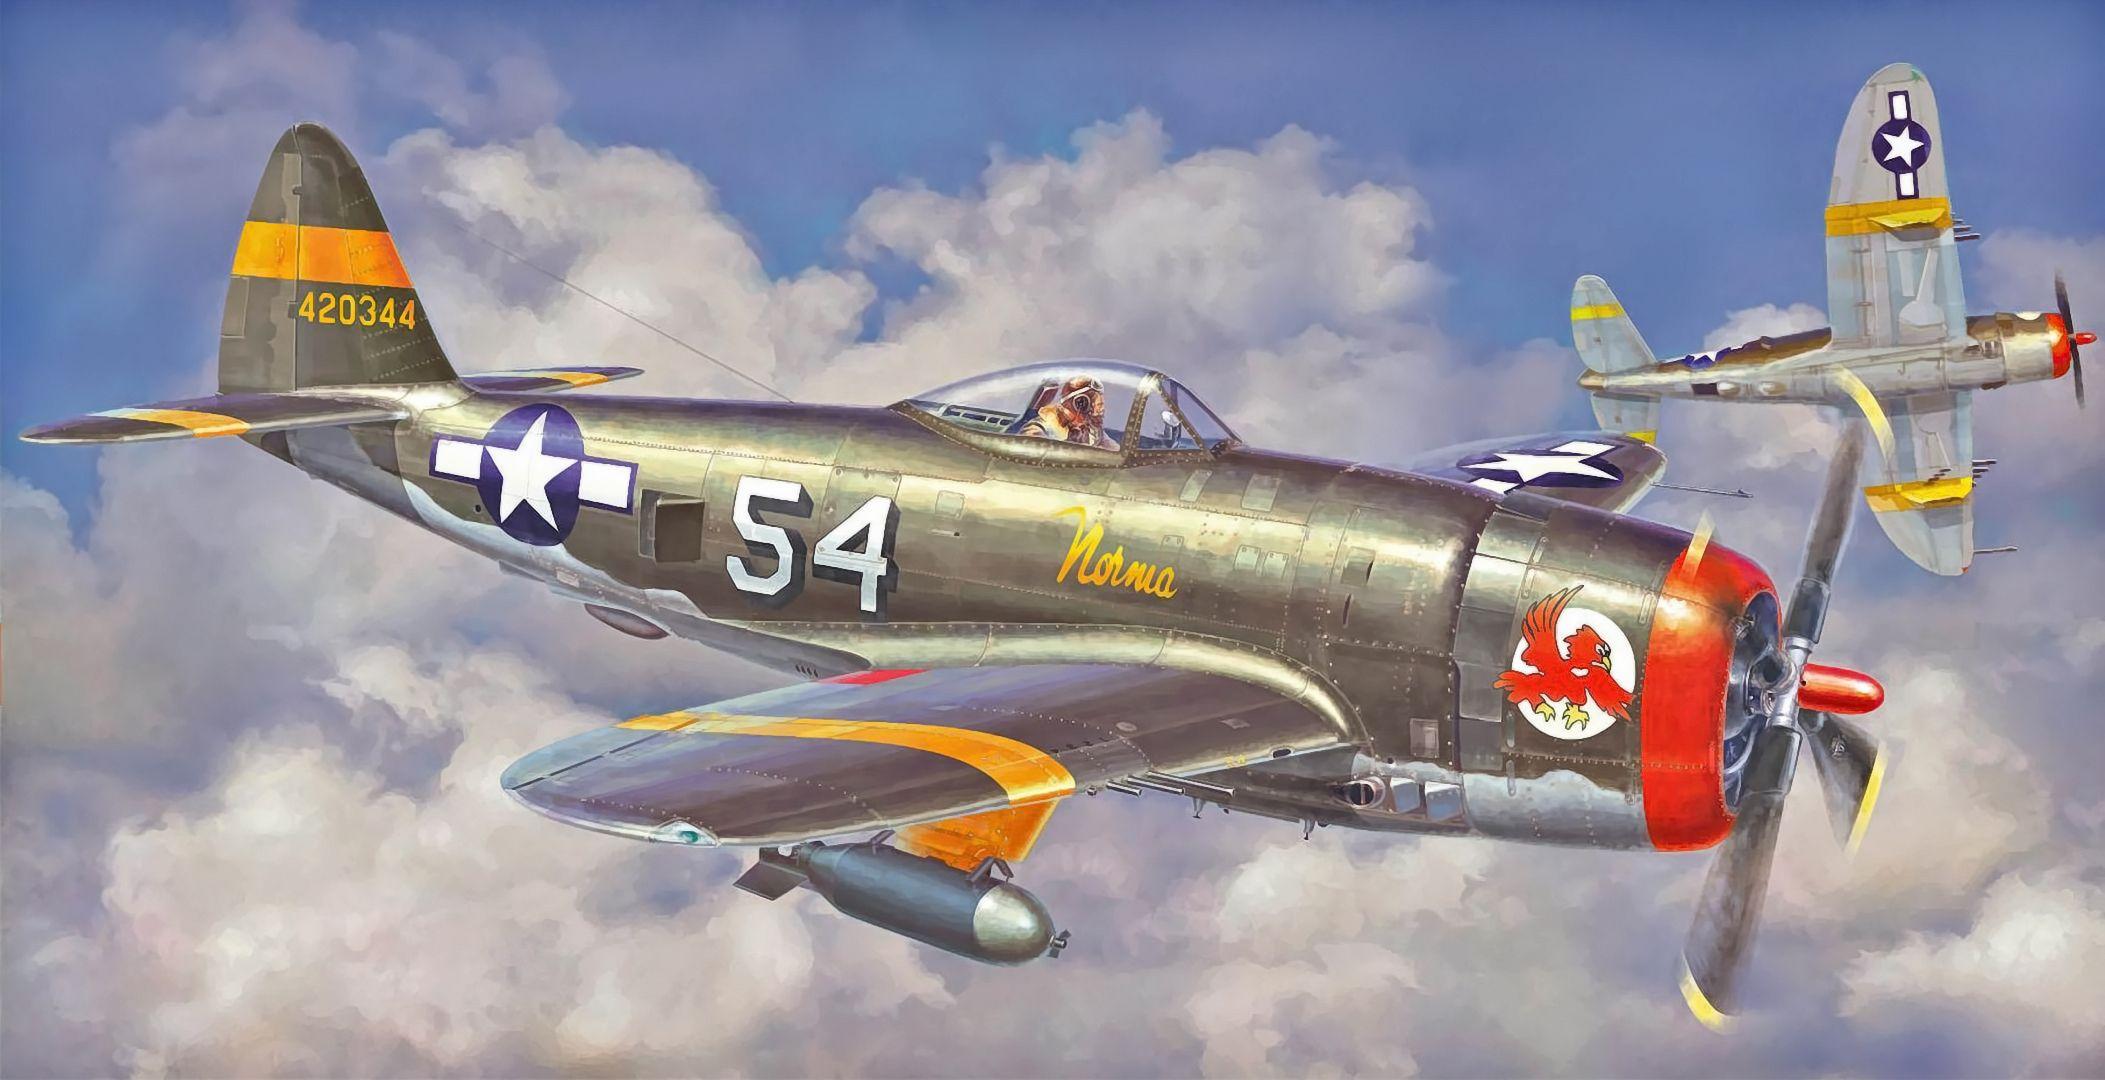 Обои war, painting, aviation, ww2, aircraft, air combat, P 47 thunderbolt, drawing, dogfight. Авиация foto 13